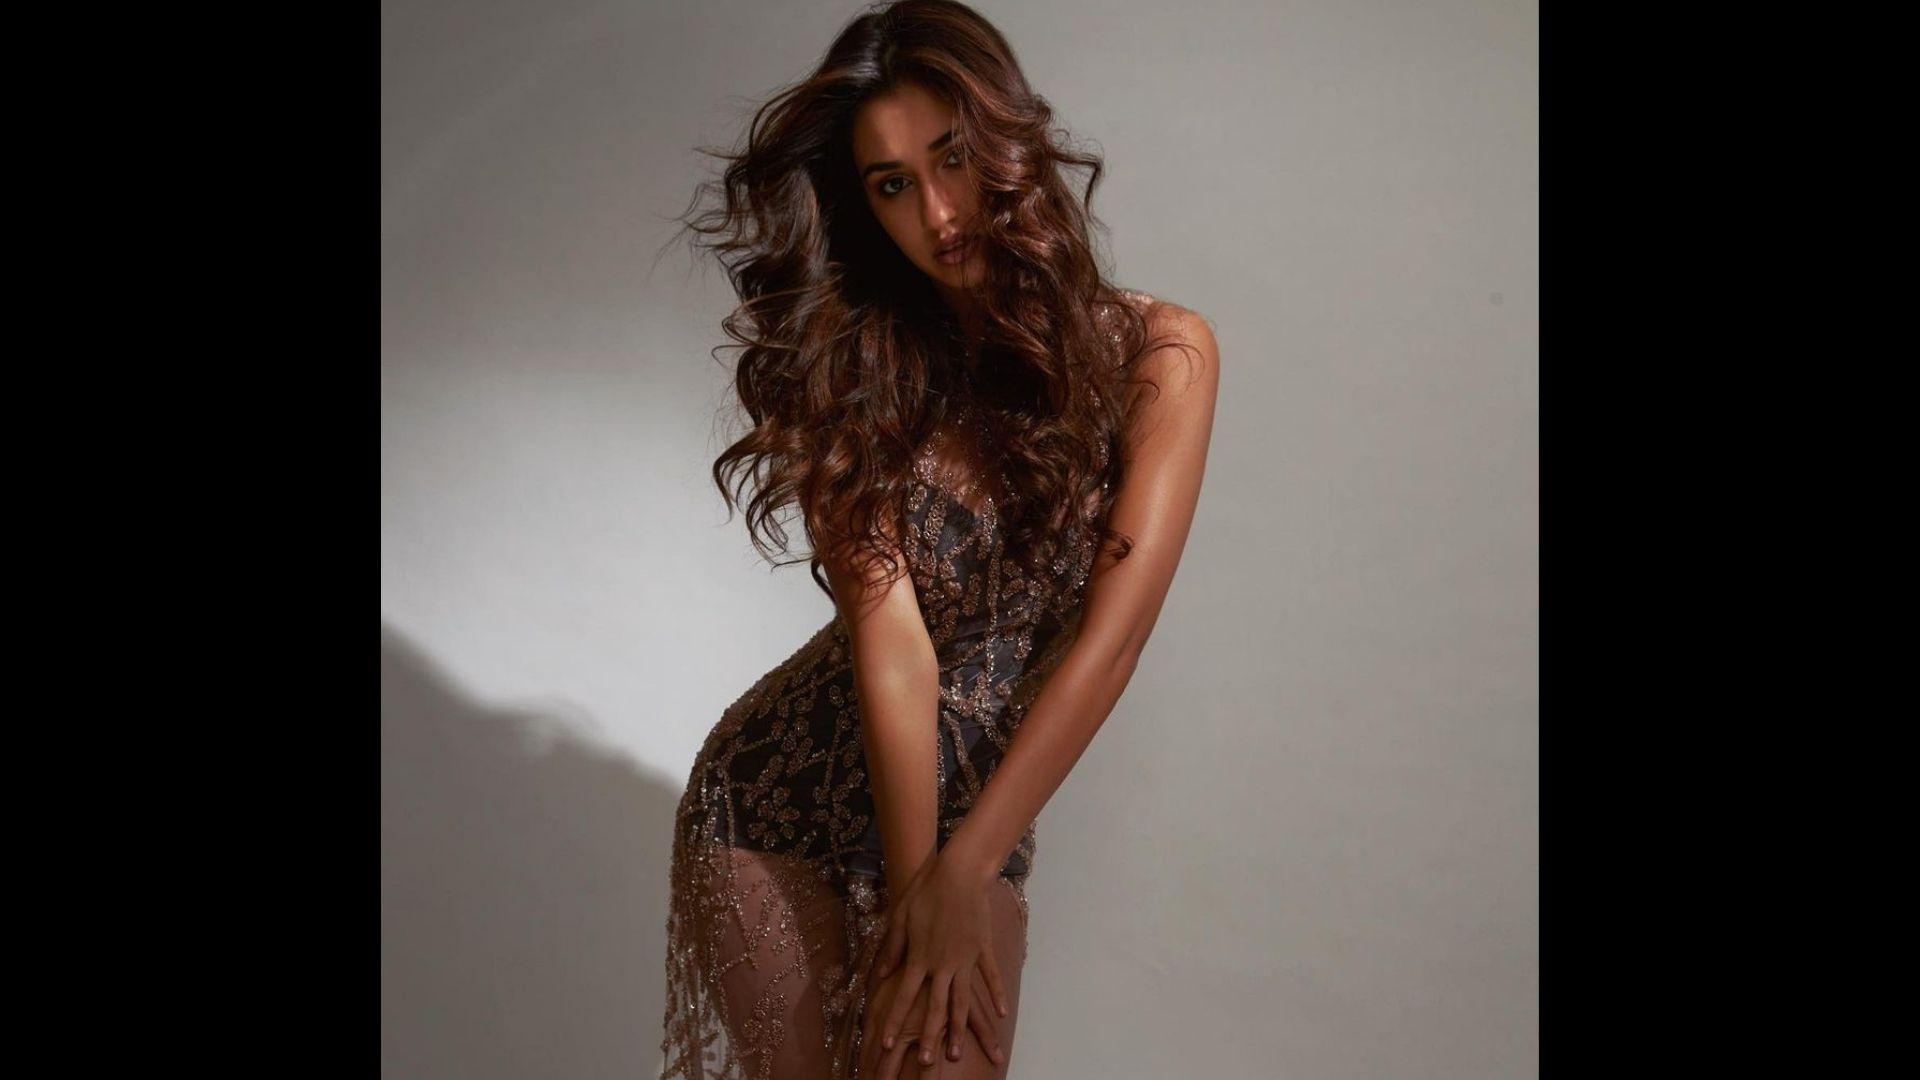 Disha Patani Looks Breathtakingly Sexy In Her Latest Shoot; Raises The Temperature Soaring – PIC Inside